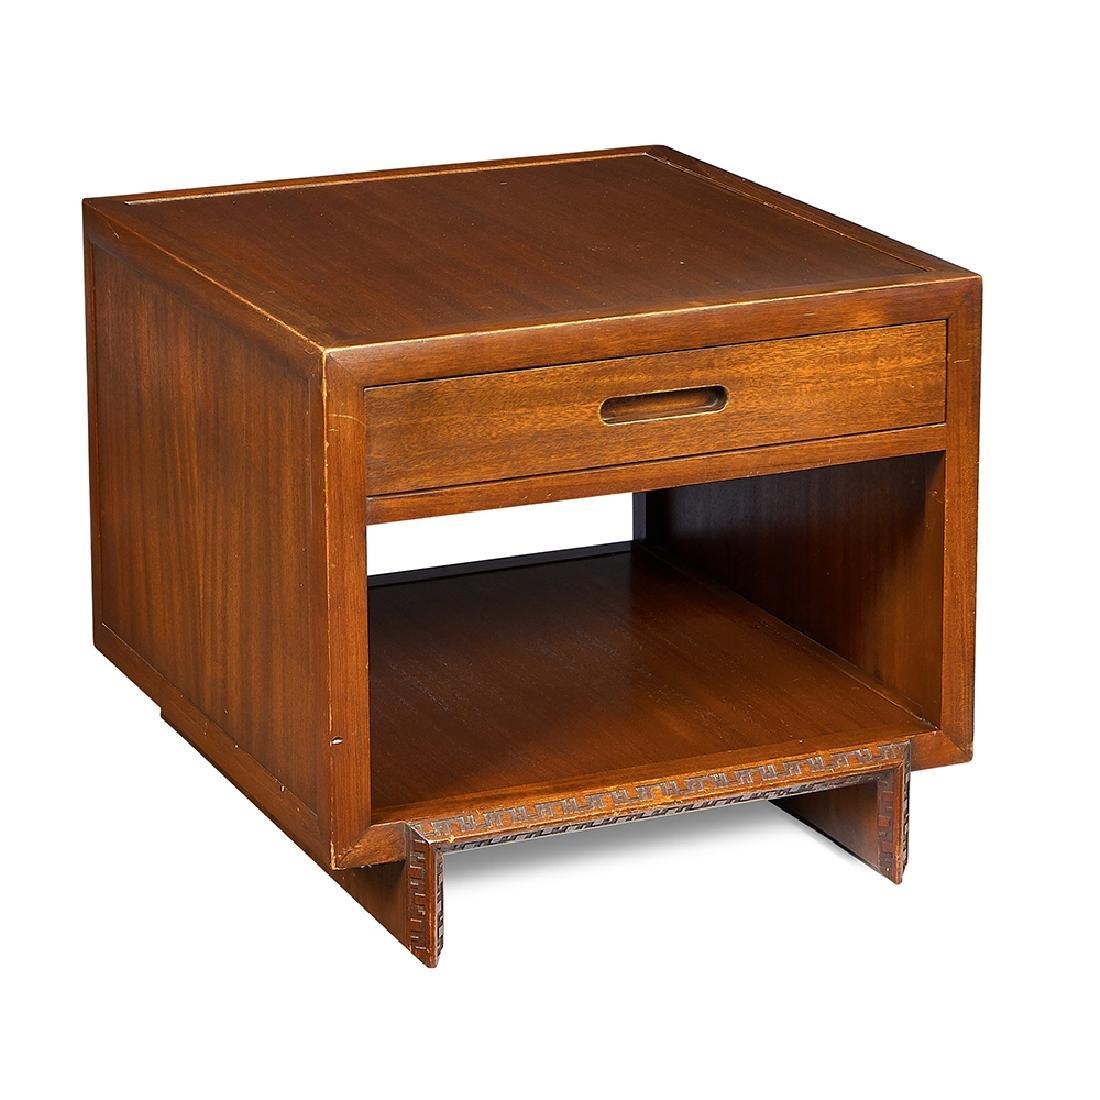 Frank Lloyd Wright / Henredon side table